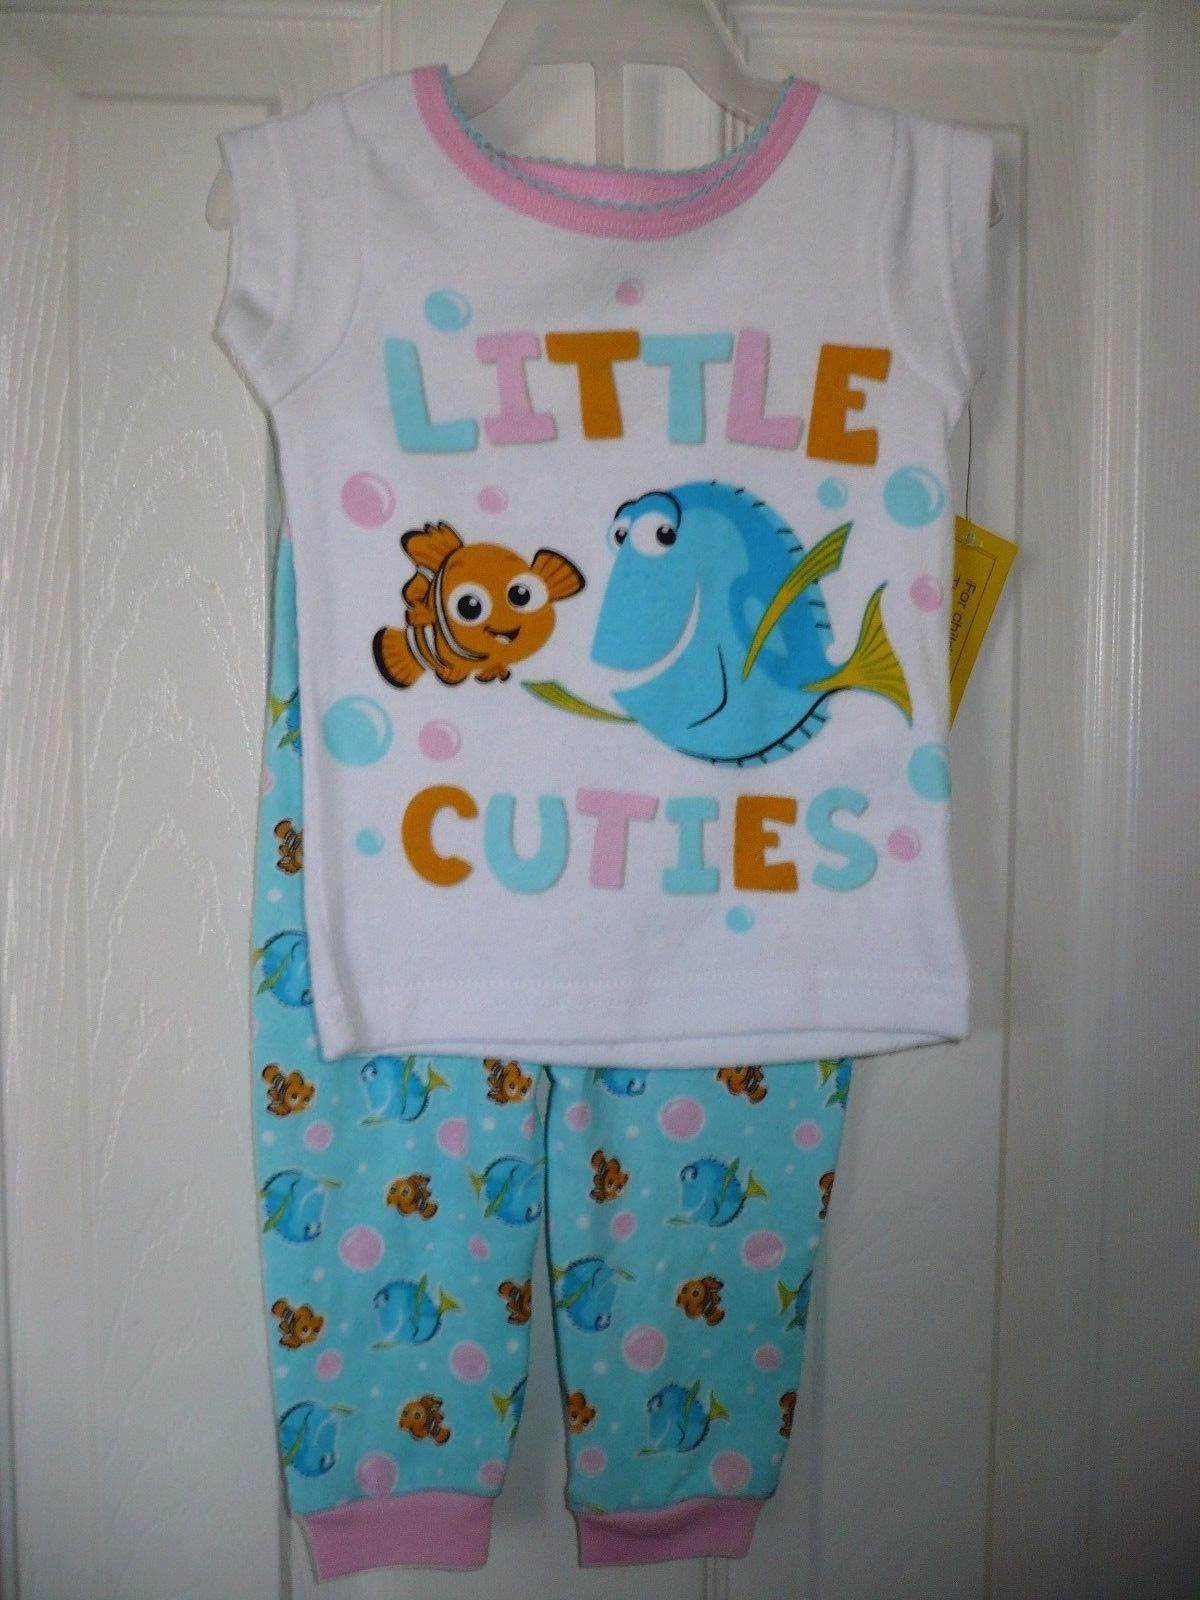 de1c18ef3 Finding Dory Girls Pajamas Little Cuties and 21 similar items